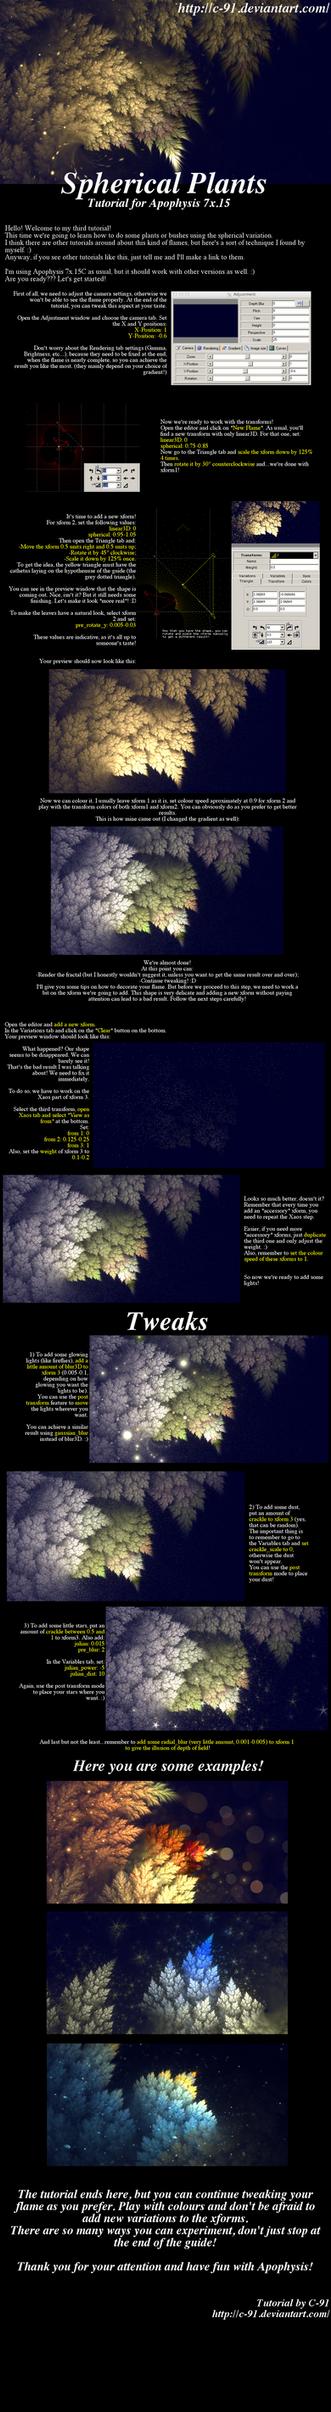 Spherical Plants Apophysis Tutorial by C-91